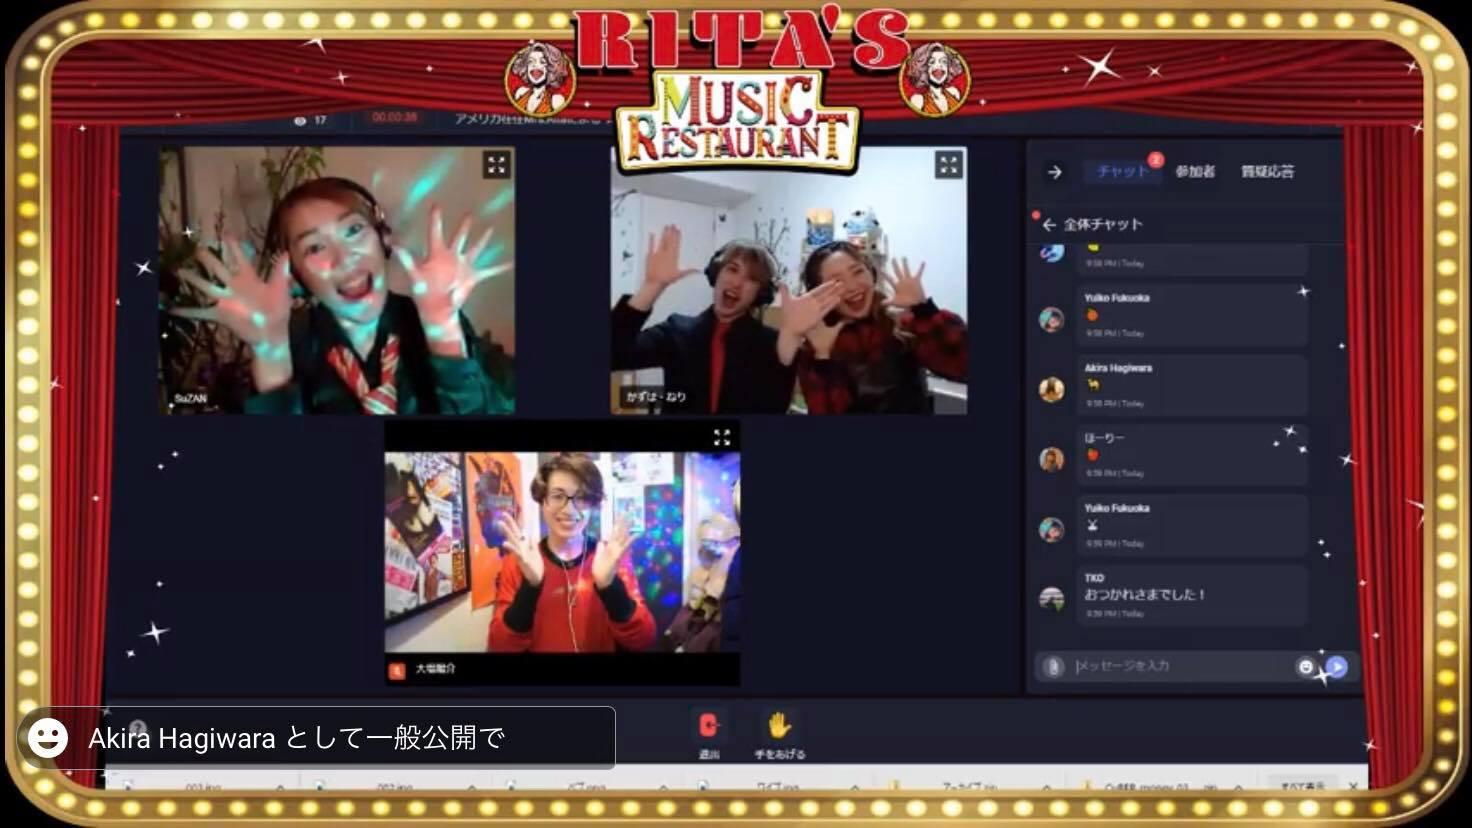 【Rita's music restaurant♪】2021.03.17:SuZAN・井上万葉・練子隼人・guest:大場陽介